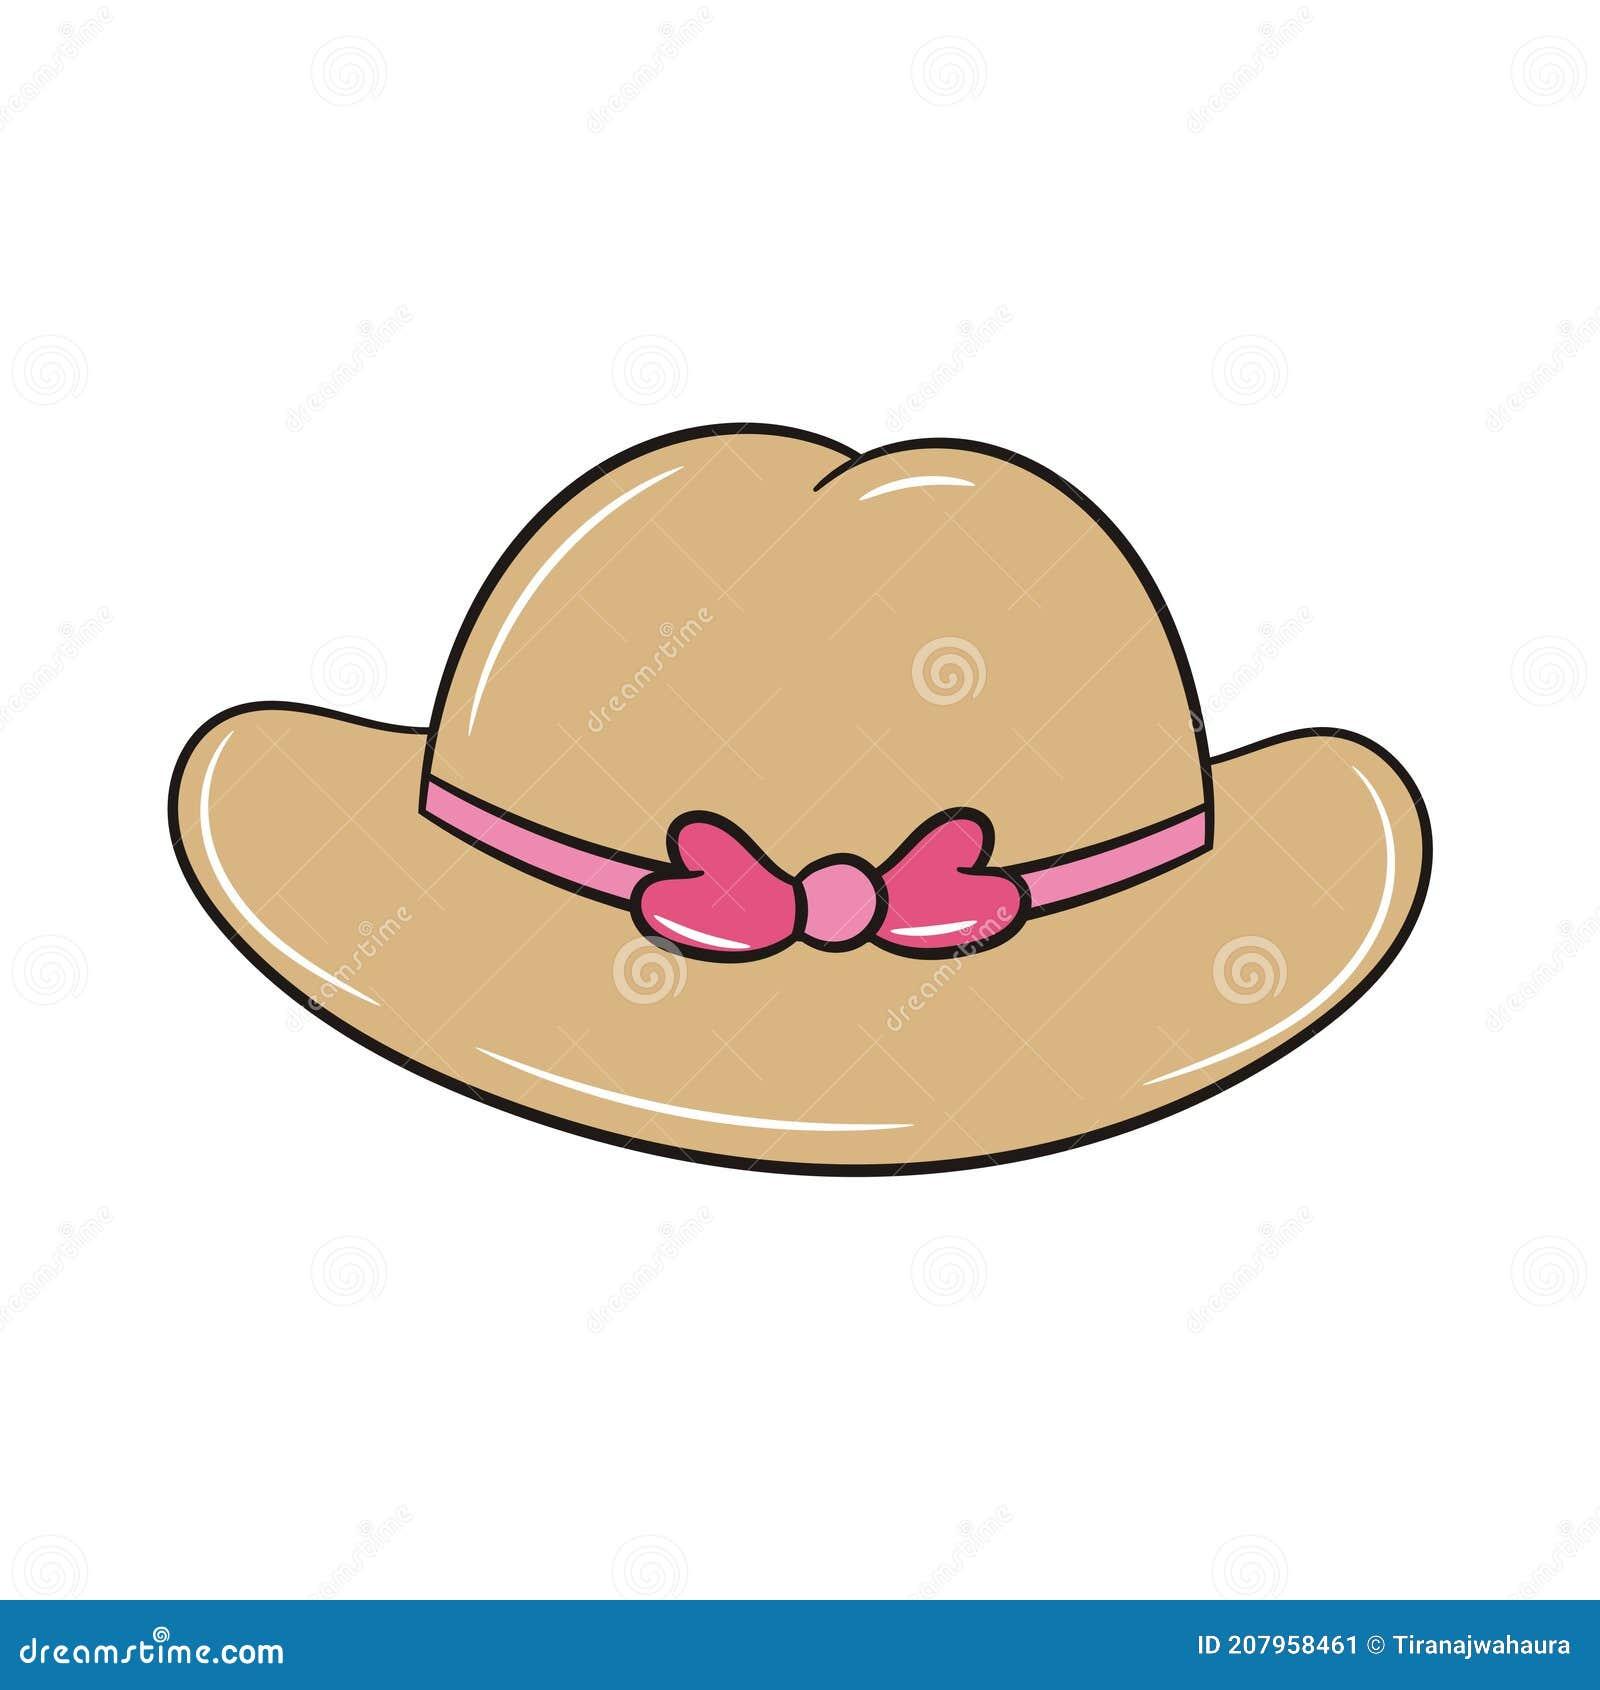 Bucket Hat Stock Illustrations 4 421 Bucket Hat Stock Illustrations Vectors Clipart Dreamstime